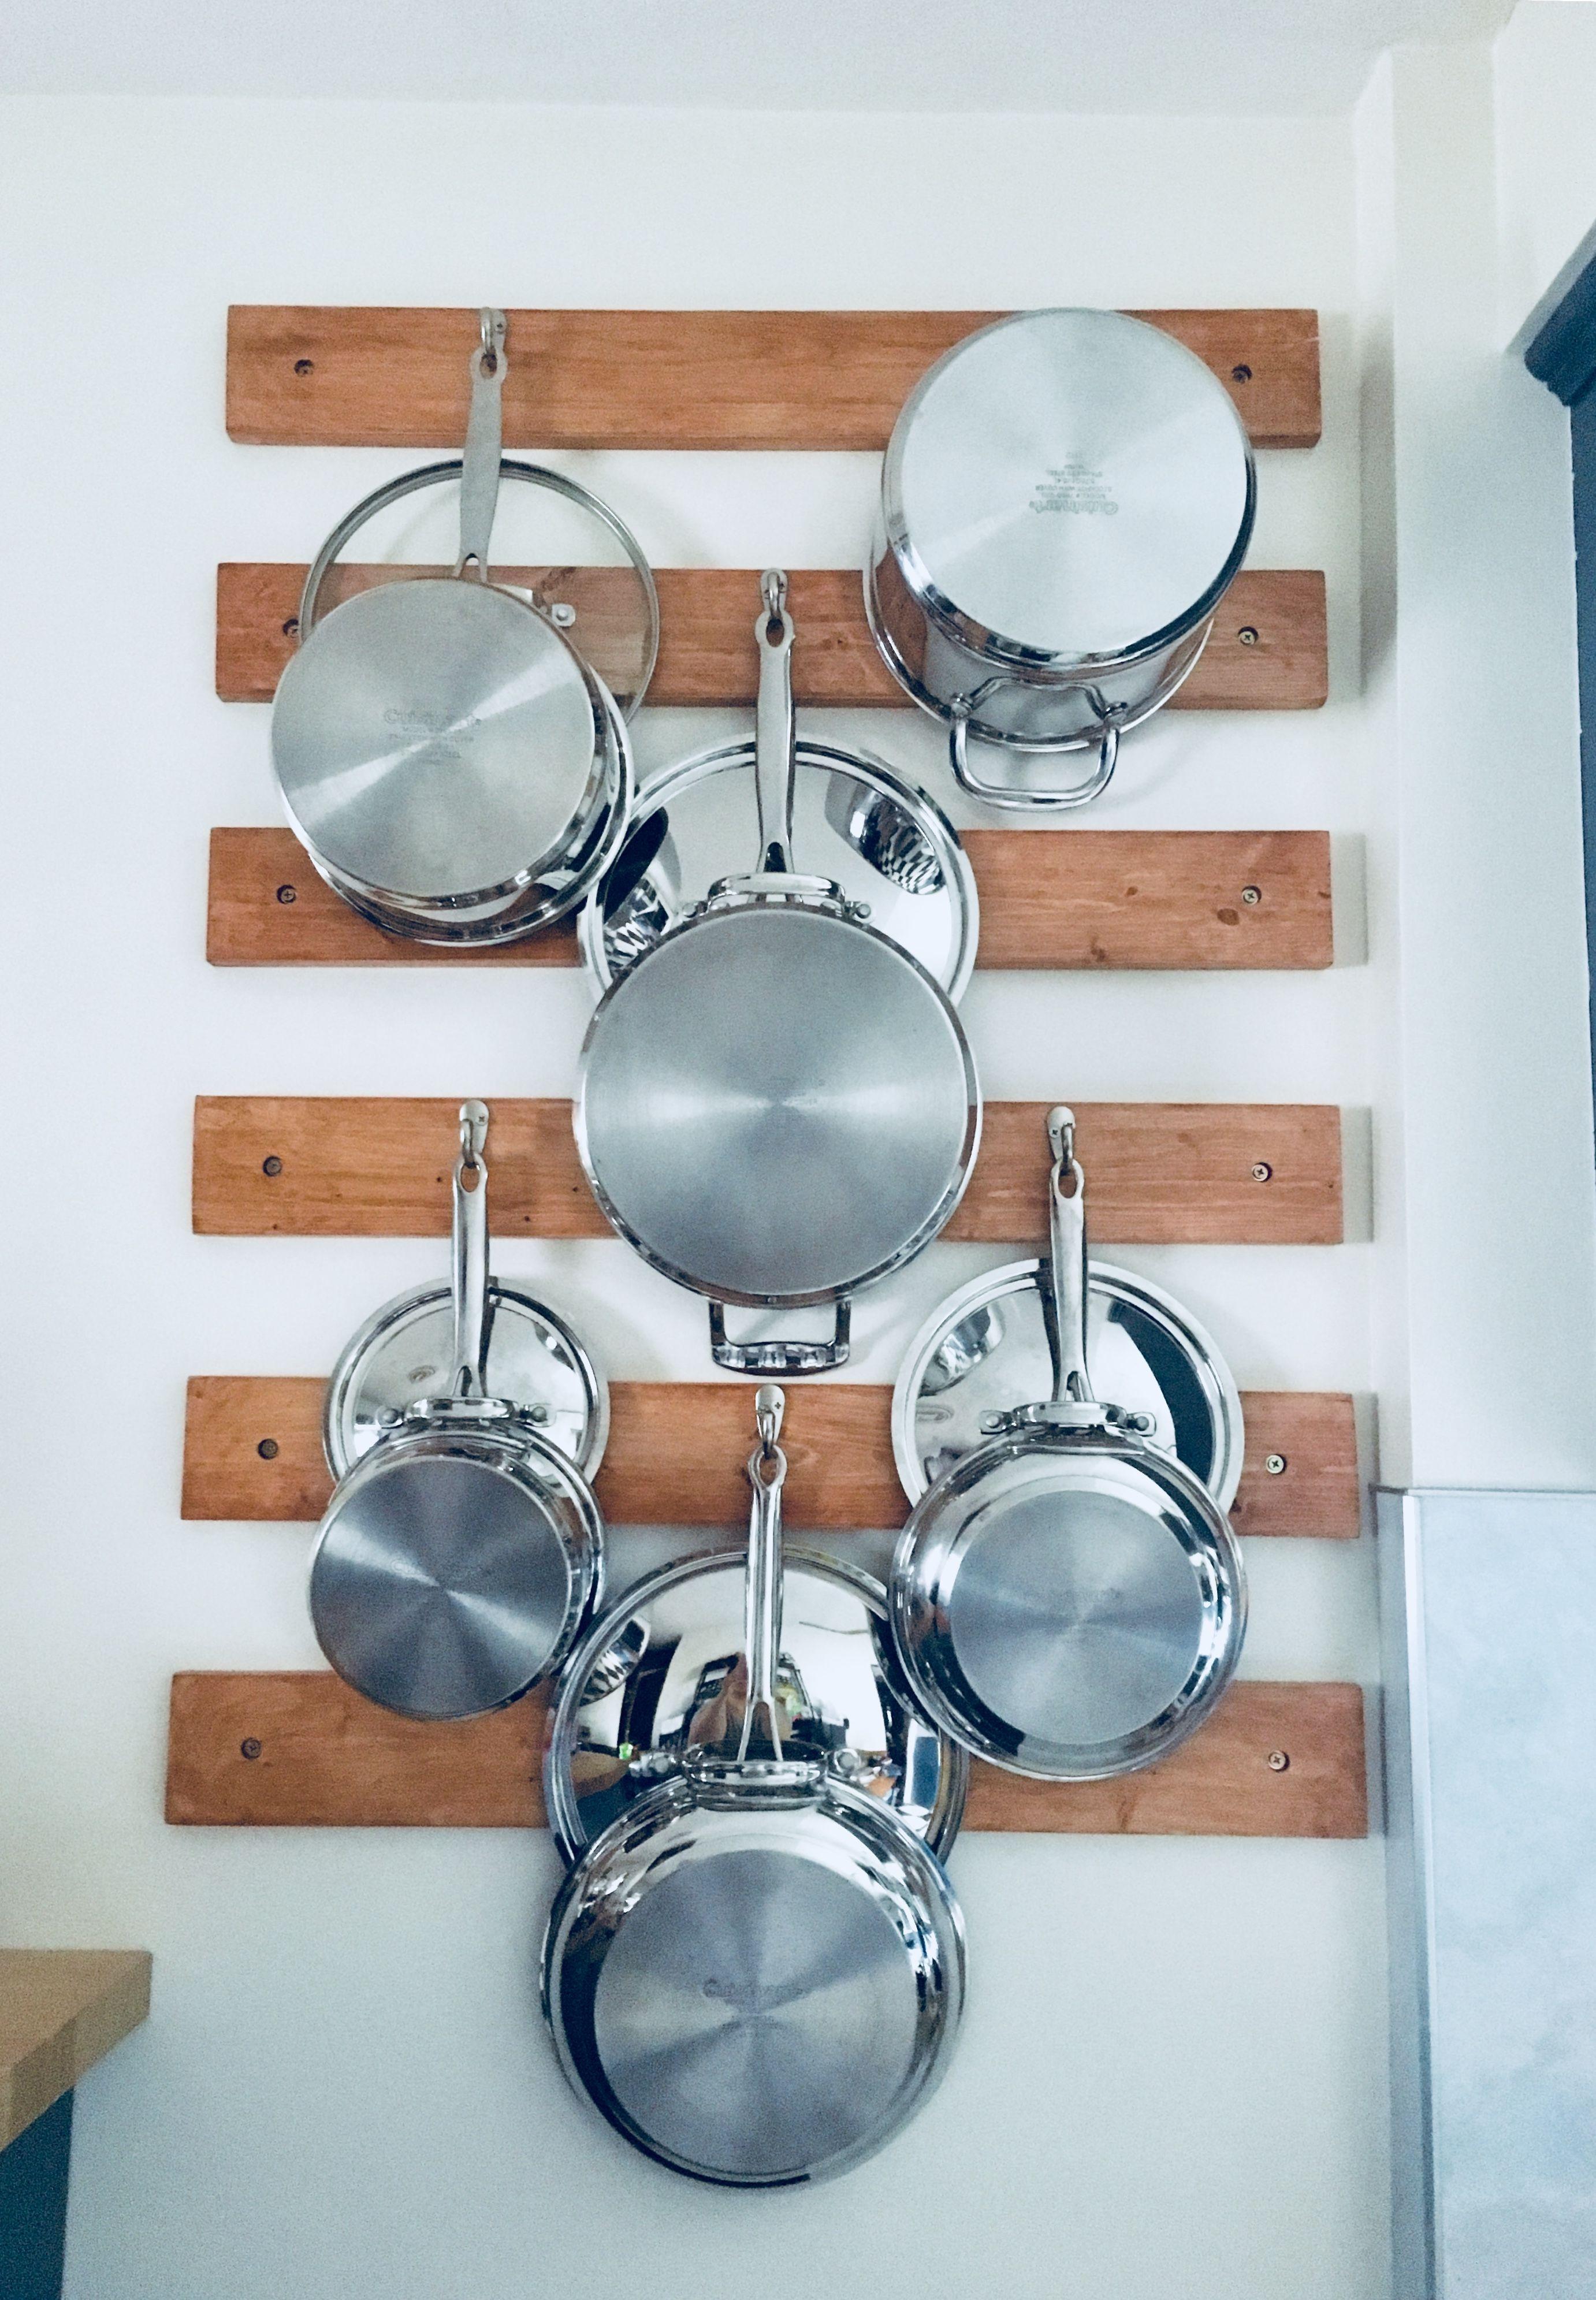 Diy Wall Mounted Pot Rack Small House Kitchen Ideas Pot Rack Hanging Pot Hanger Pots and pans wall rack